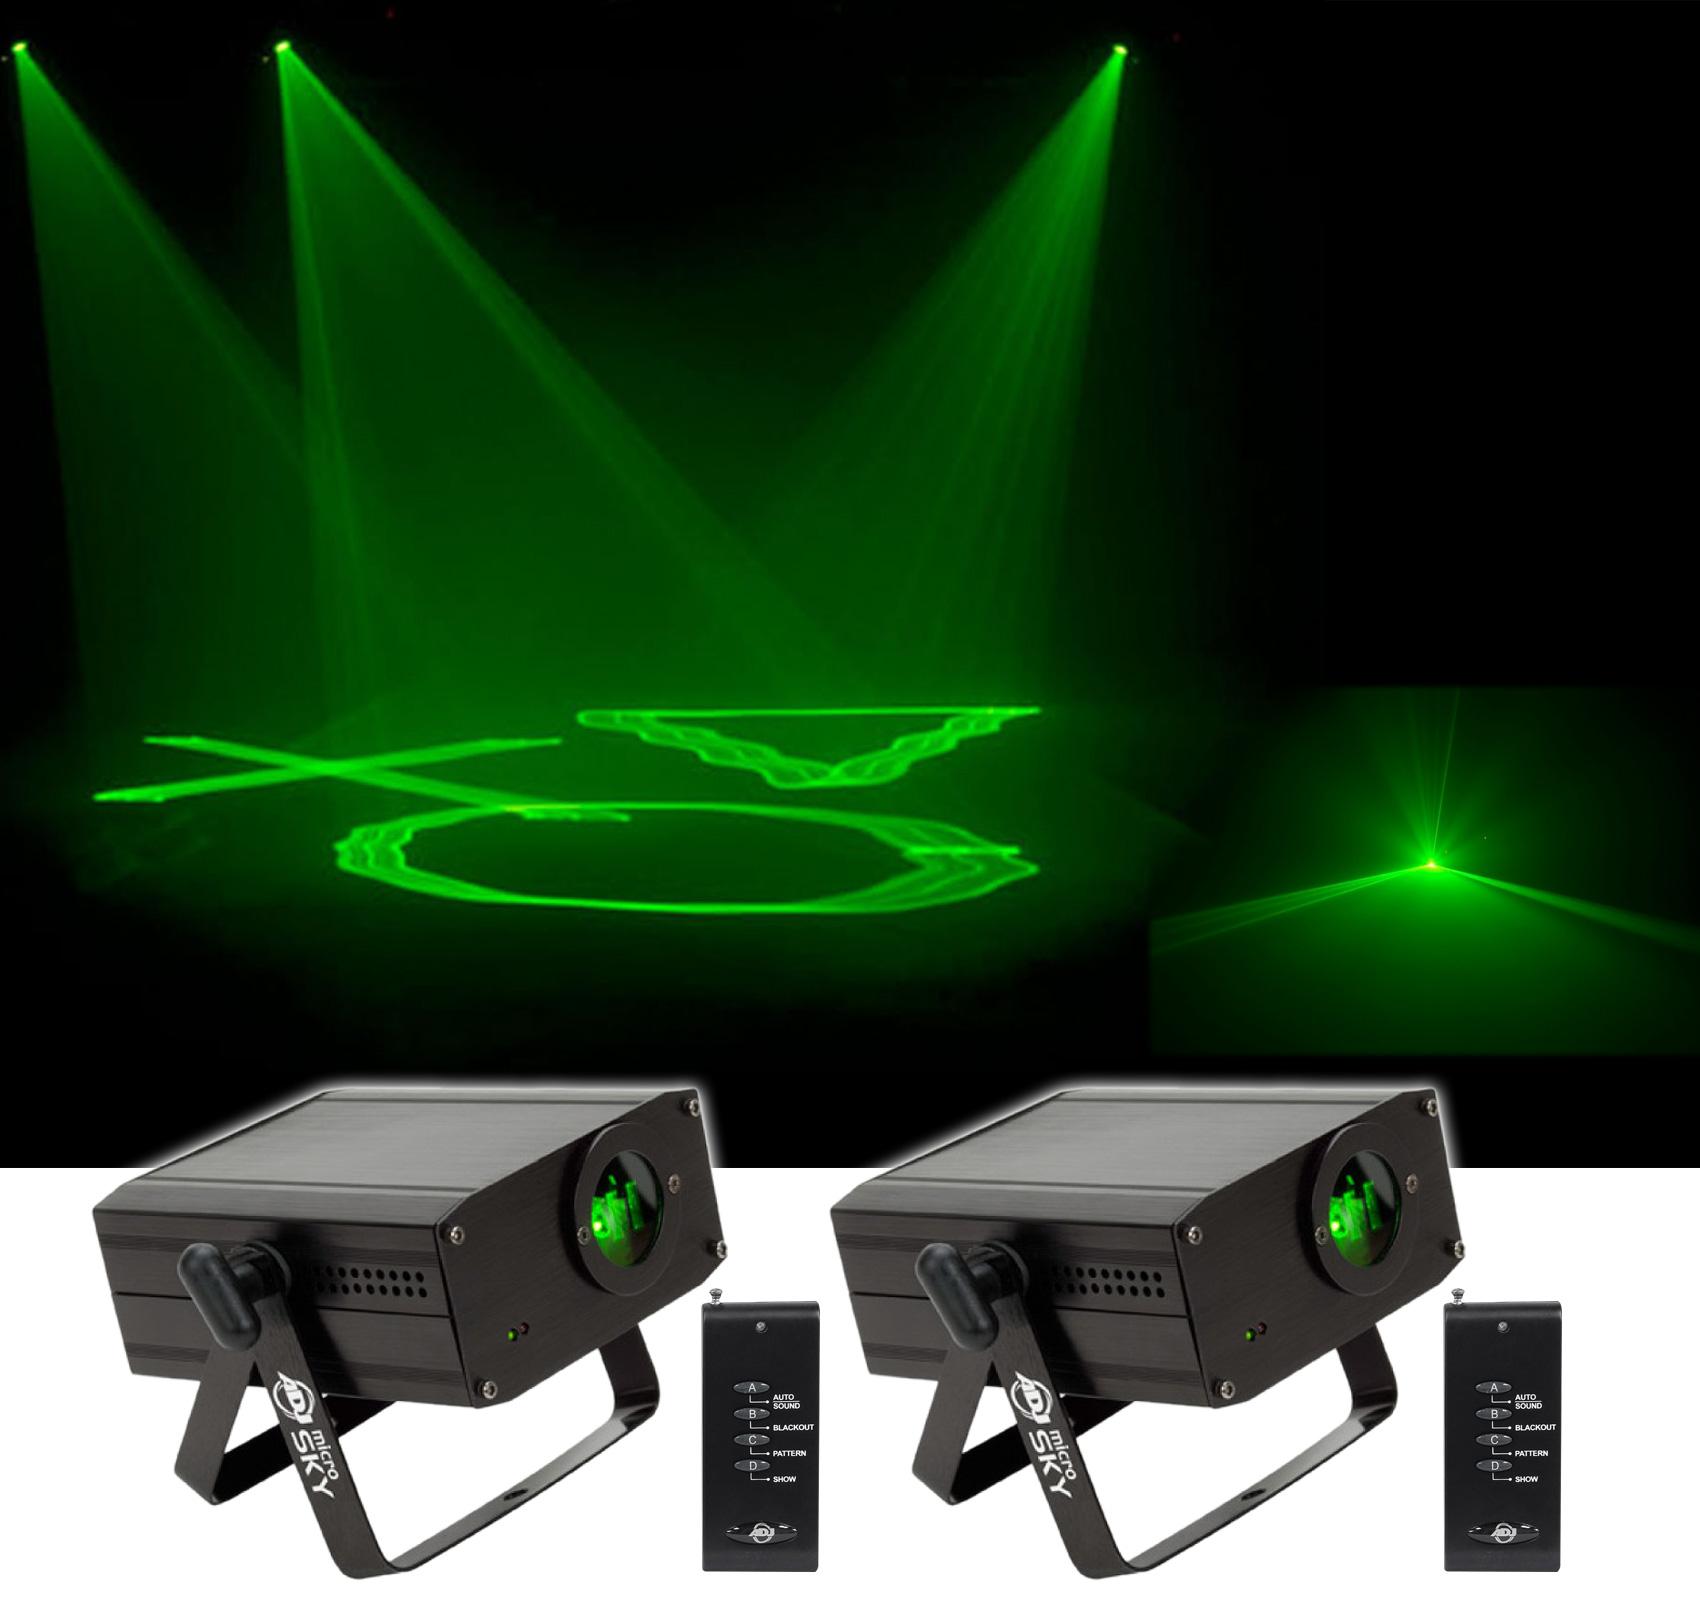 (2) American DJ MICRO SKY Mini Green Laser w/ Liquid Sky Effect Club/Stage Light